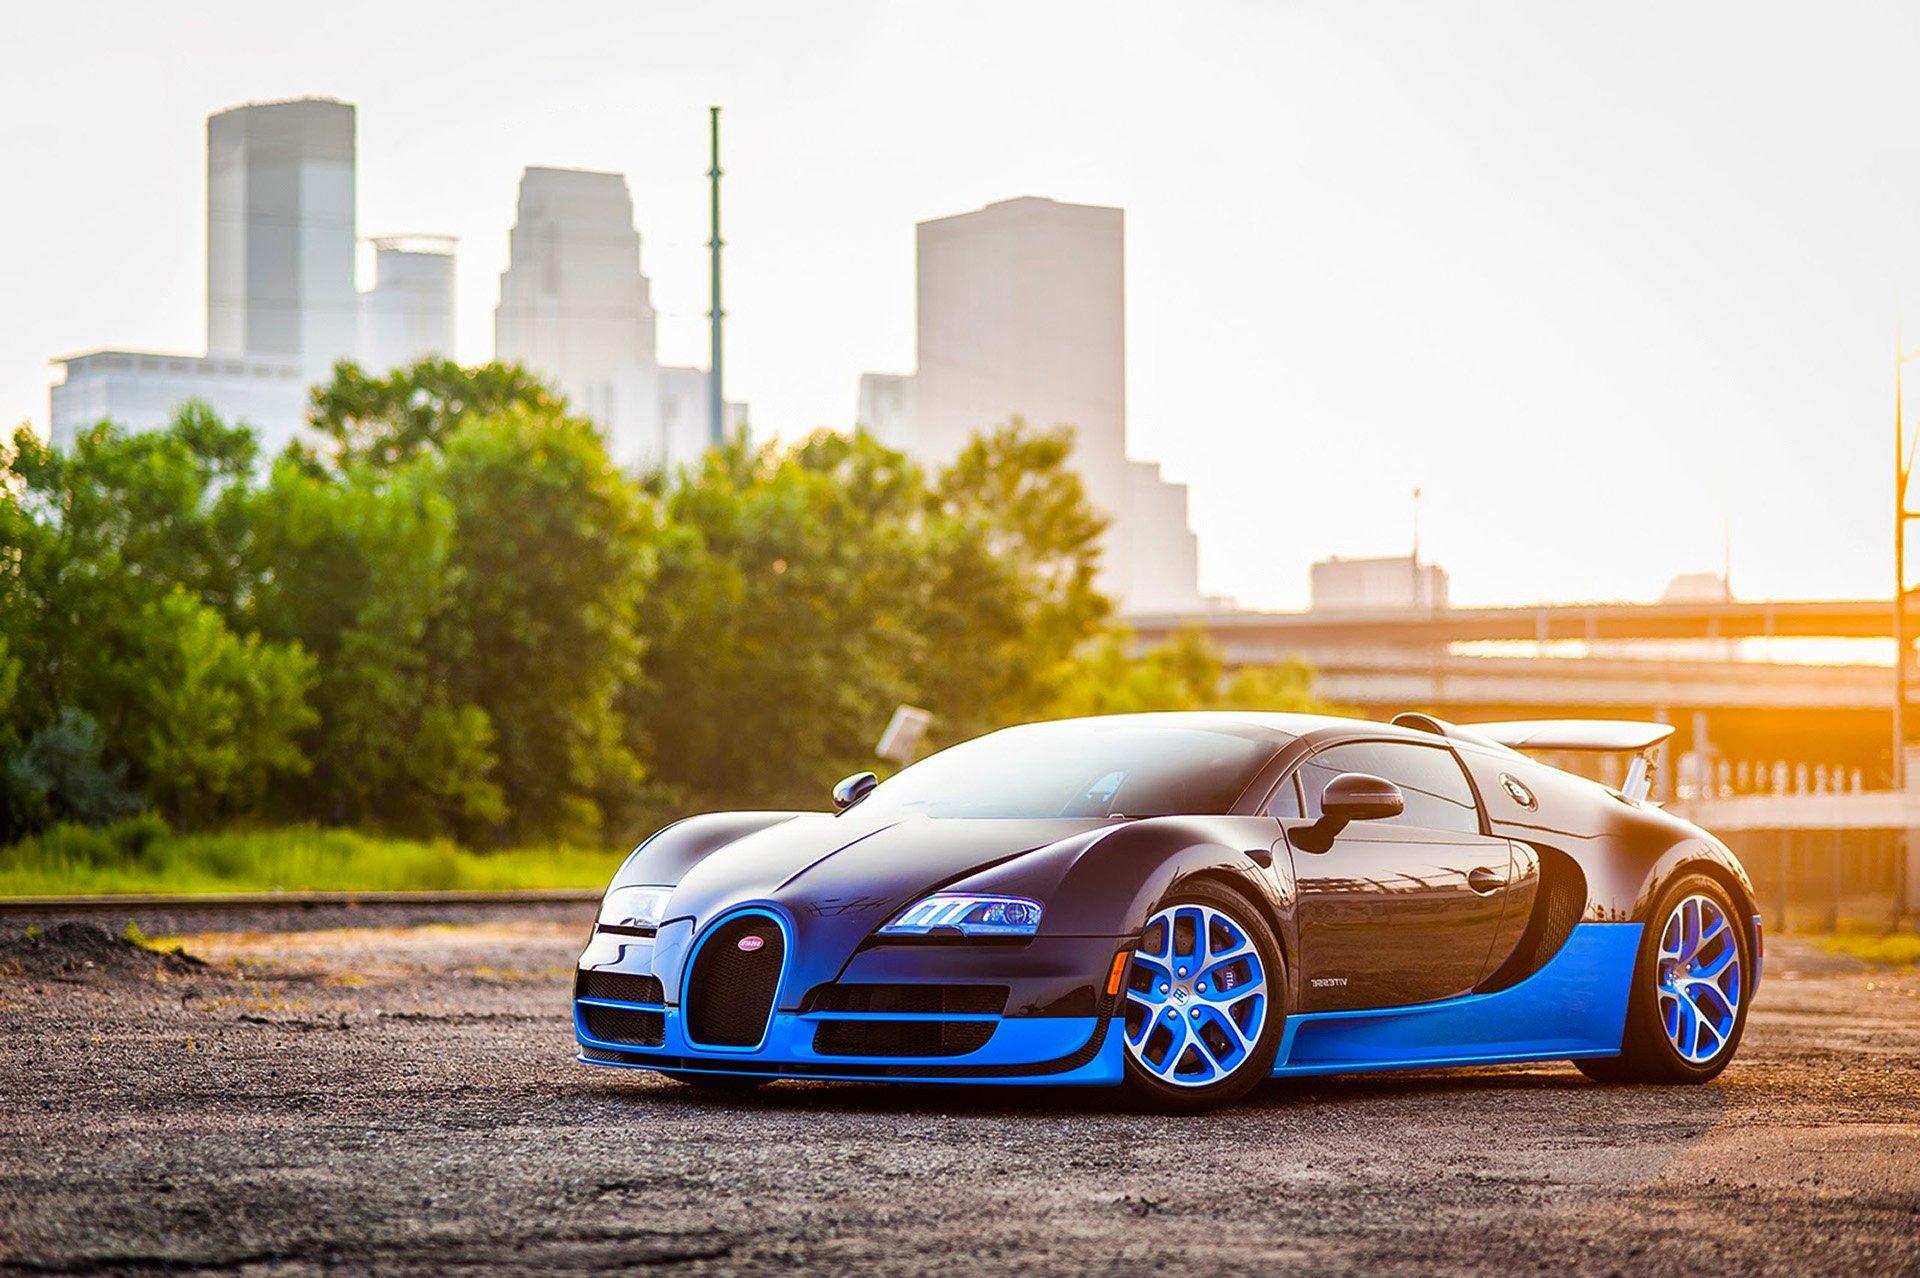 Bugatti Veyron, автомобили, бугатти вейрон, обои hd